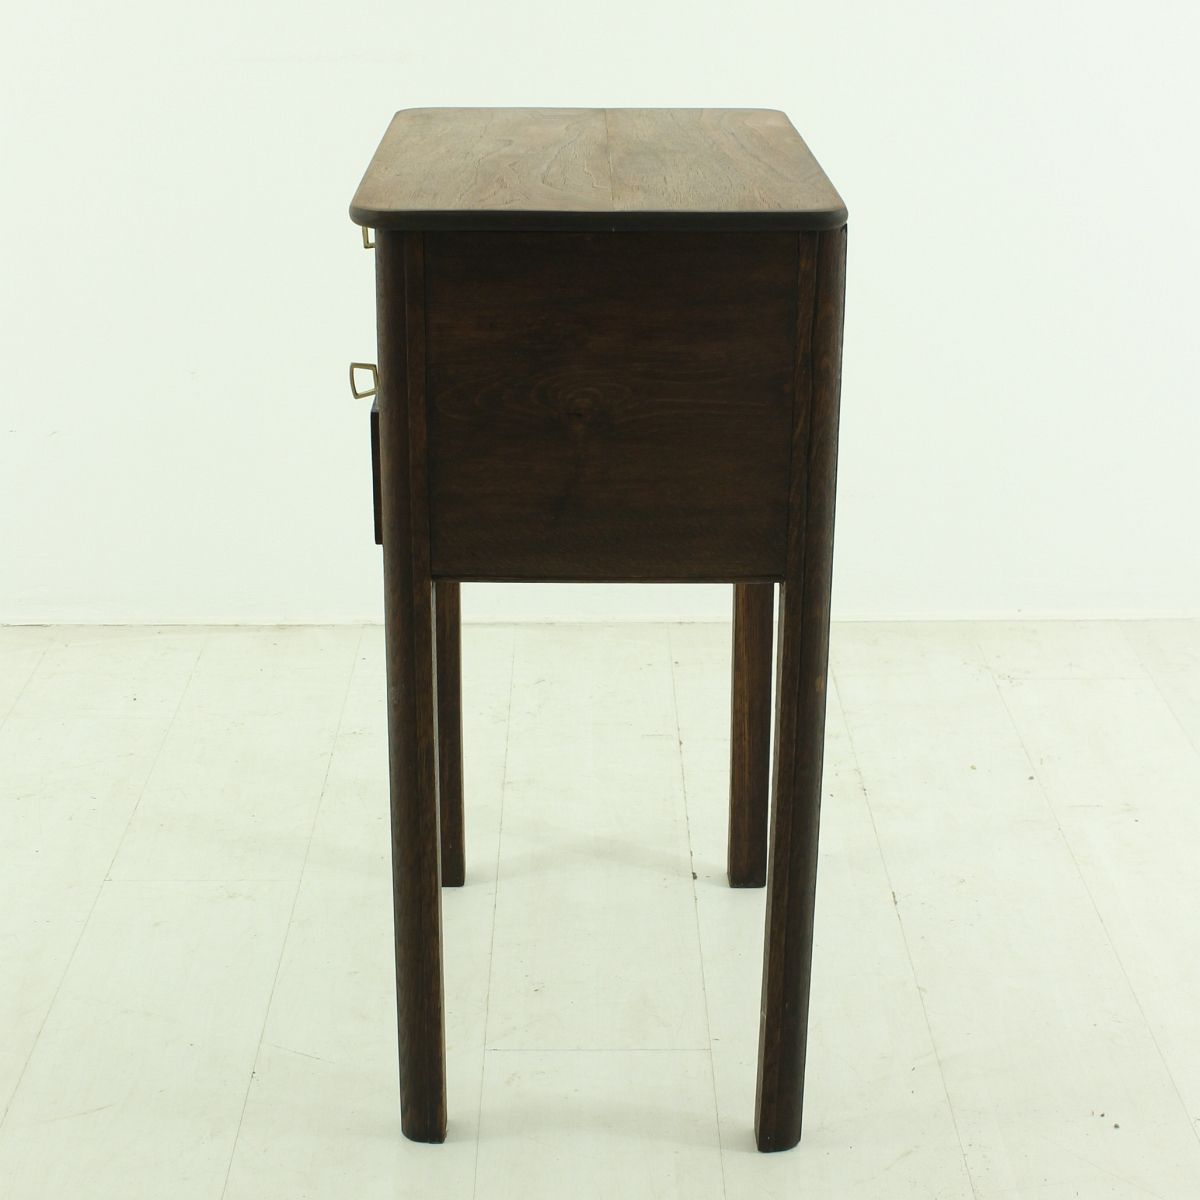 Vintage oak walnut side table 1930s for sale at pamono for Walnut side table